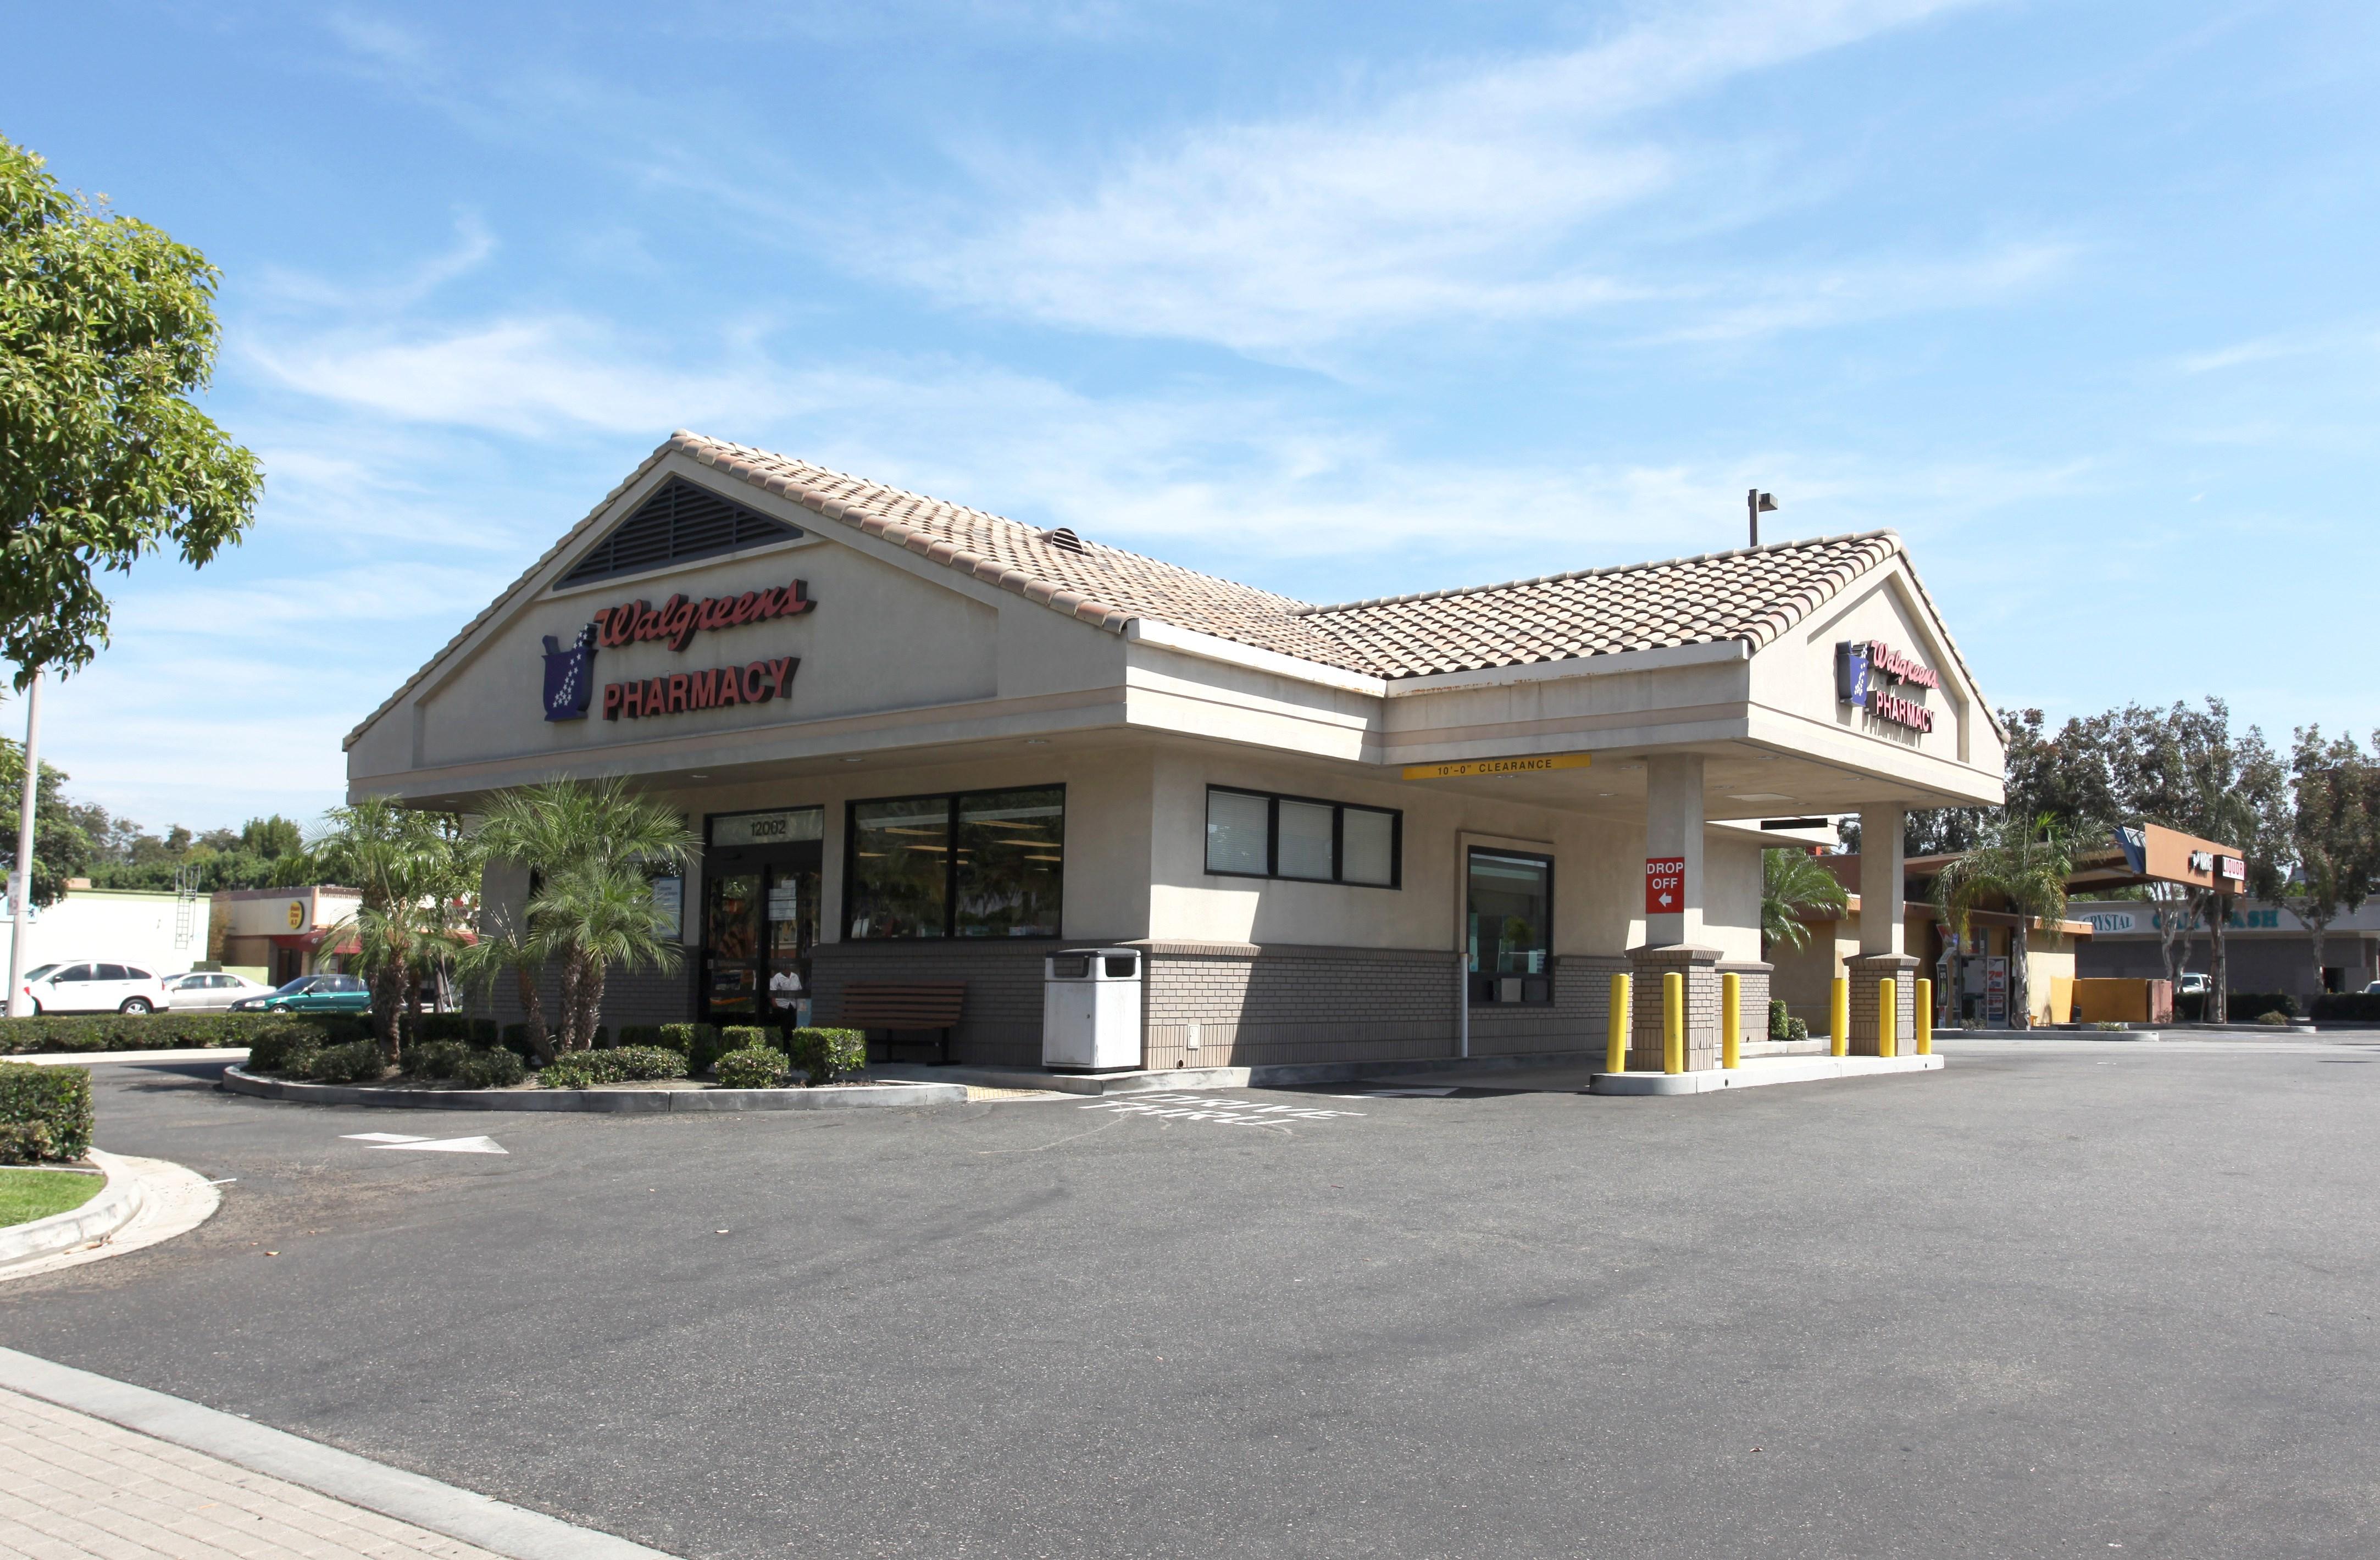 Walgreens Walgreens 3674 Harbor Blvd Garden Grove Ca 12002